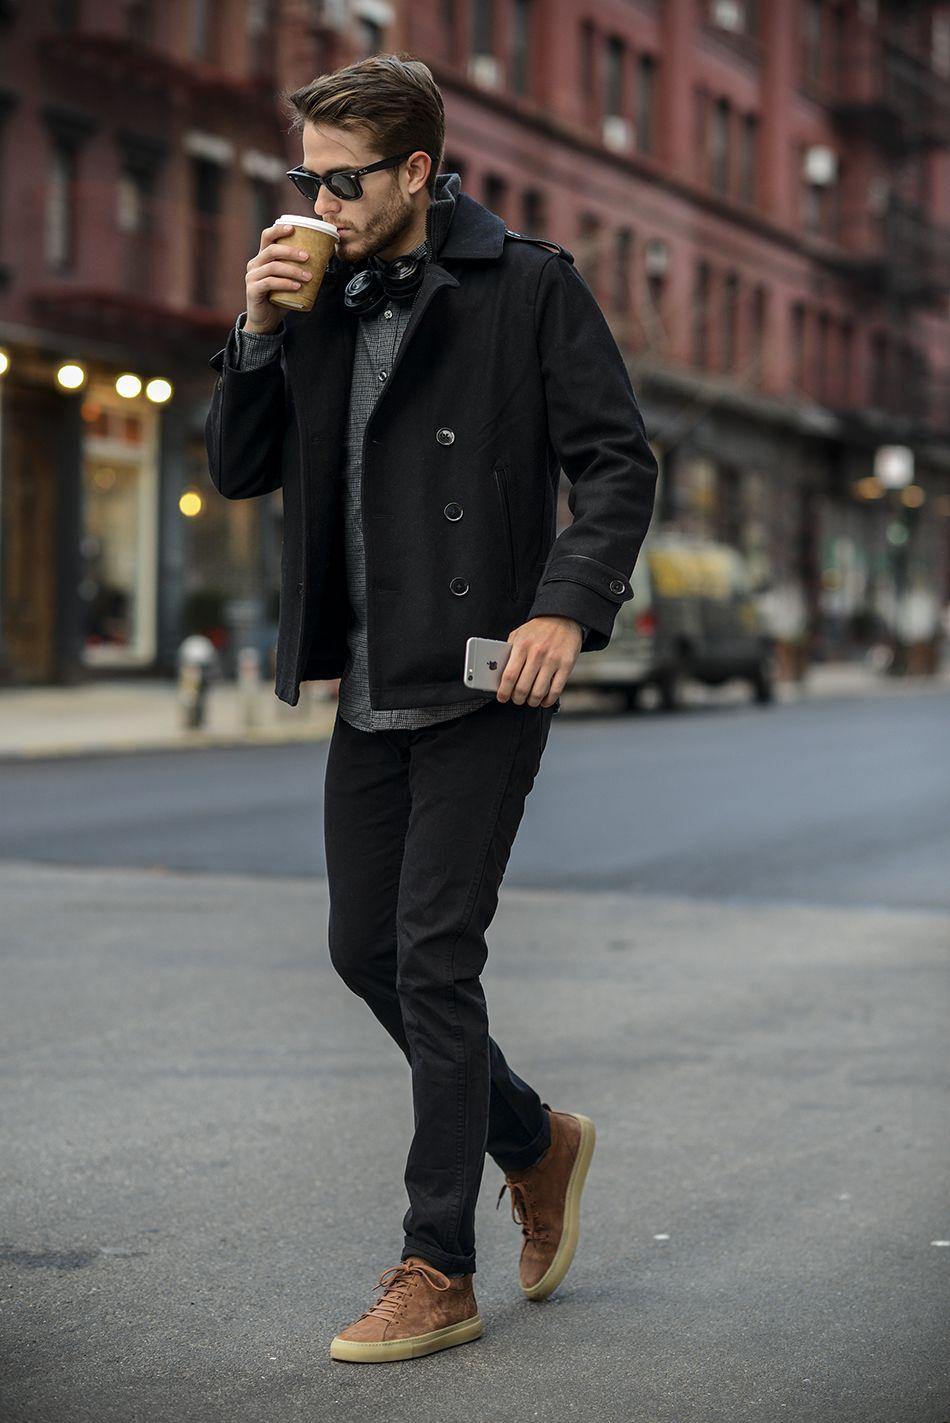 Express jacket | J.Crew shirt & jeans / 요즘 다시 무럭무럭 샘솟고 있는 데님 욕구. 올 겨울 데님 서칭의 첫 발자국.